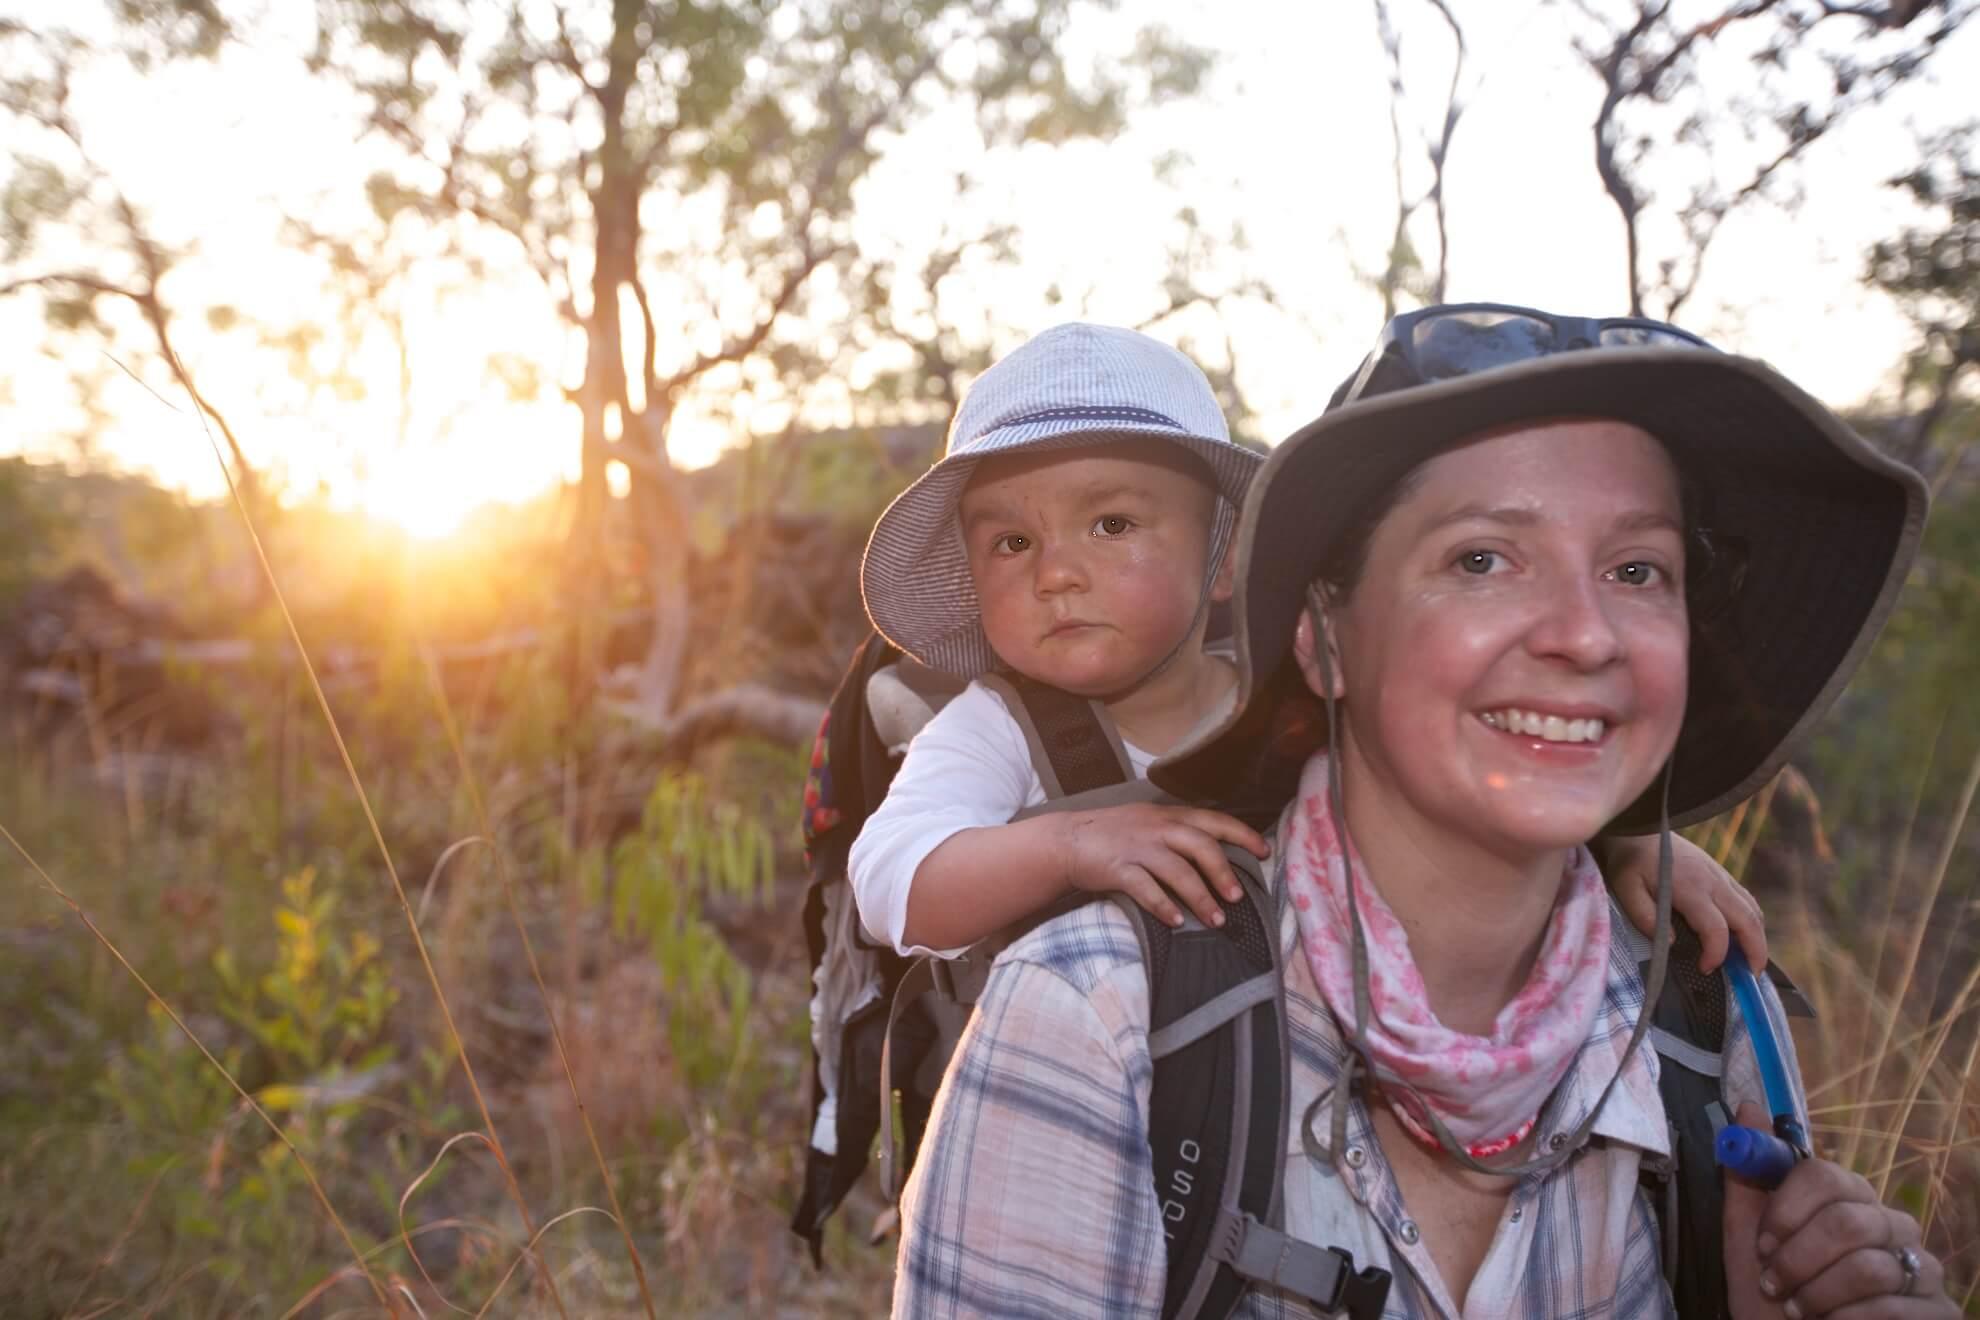 Hiking with kids 4